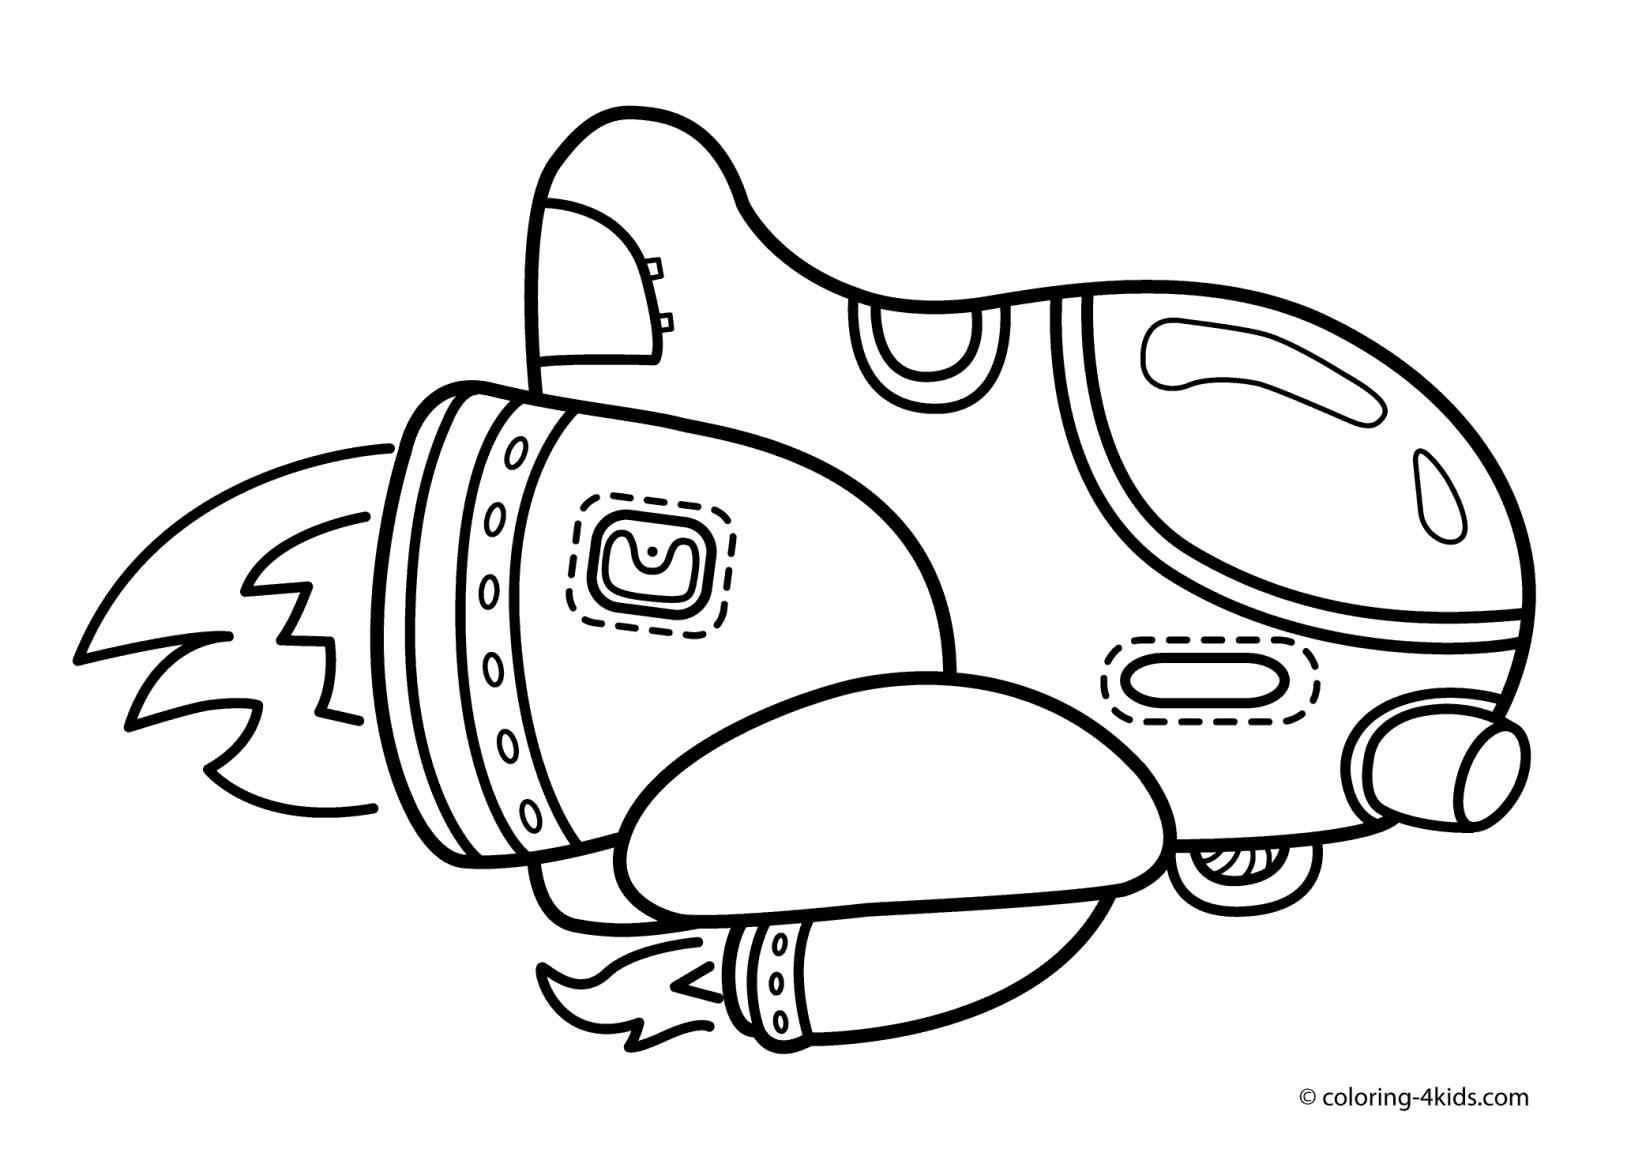 Nasa Spaceship Drawing at GetDrawings | Free download